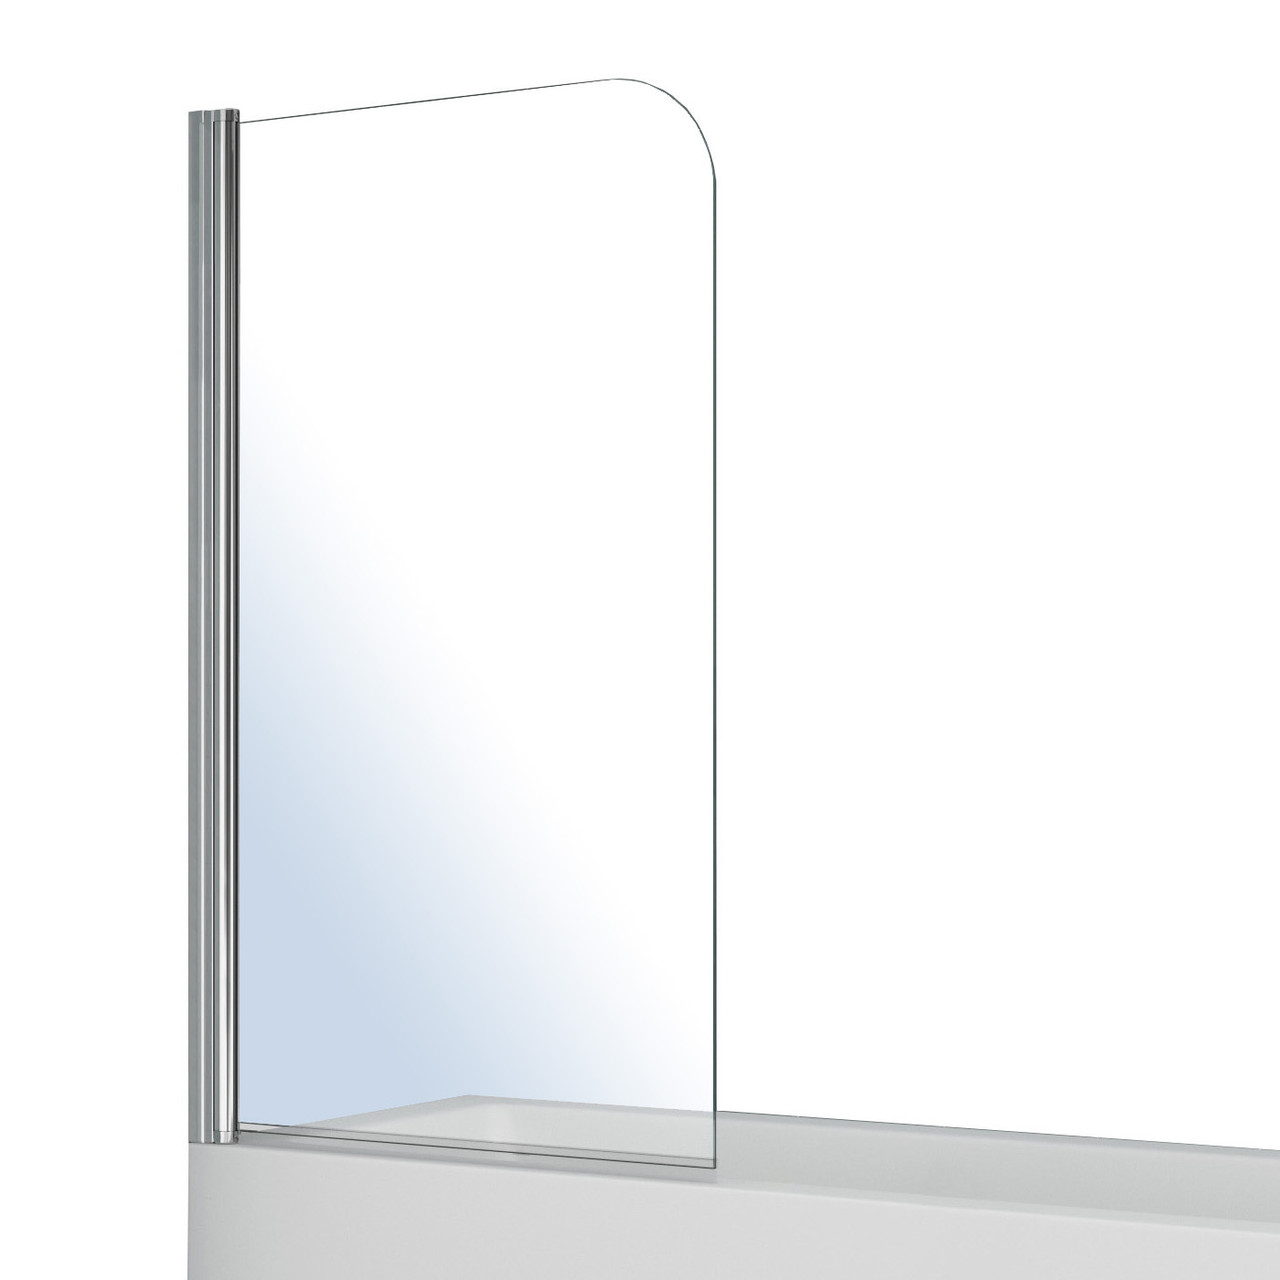 Штора на ванну Volle  односекционная 1400*800мм, поворот на 180°, прозрачное стекло 5мм